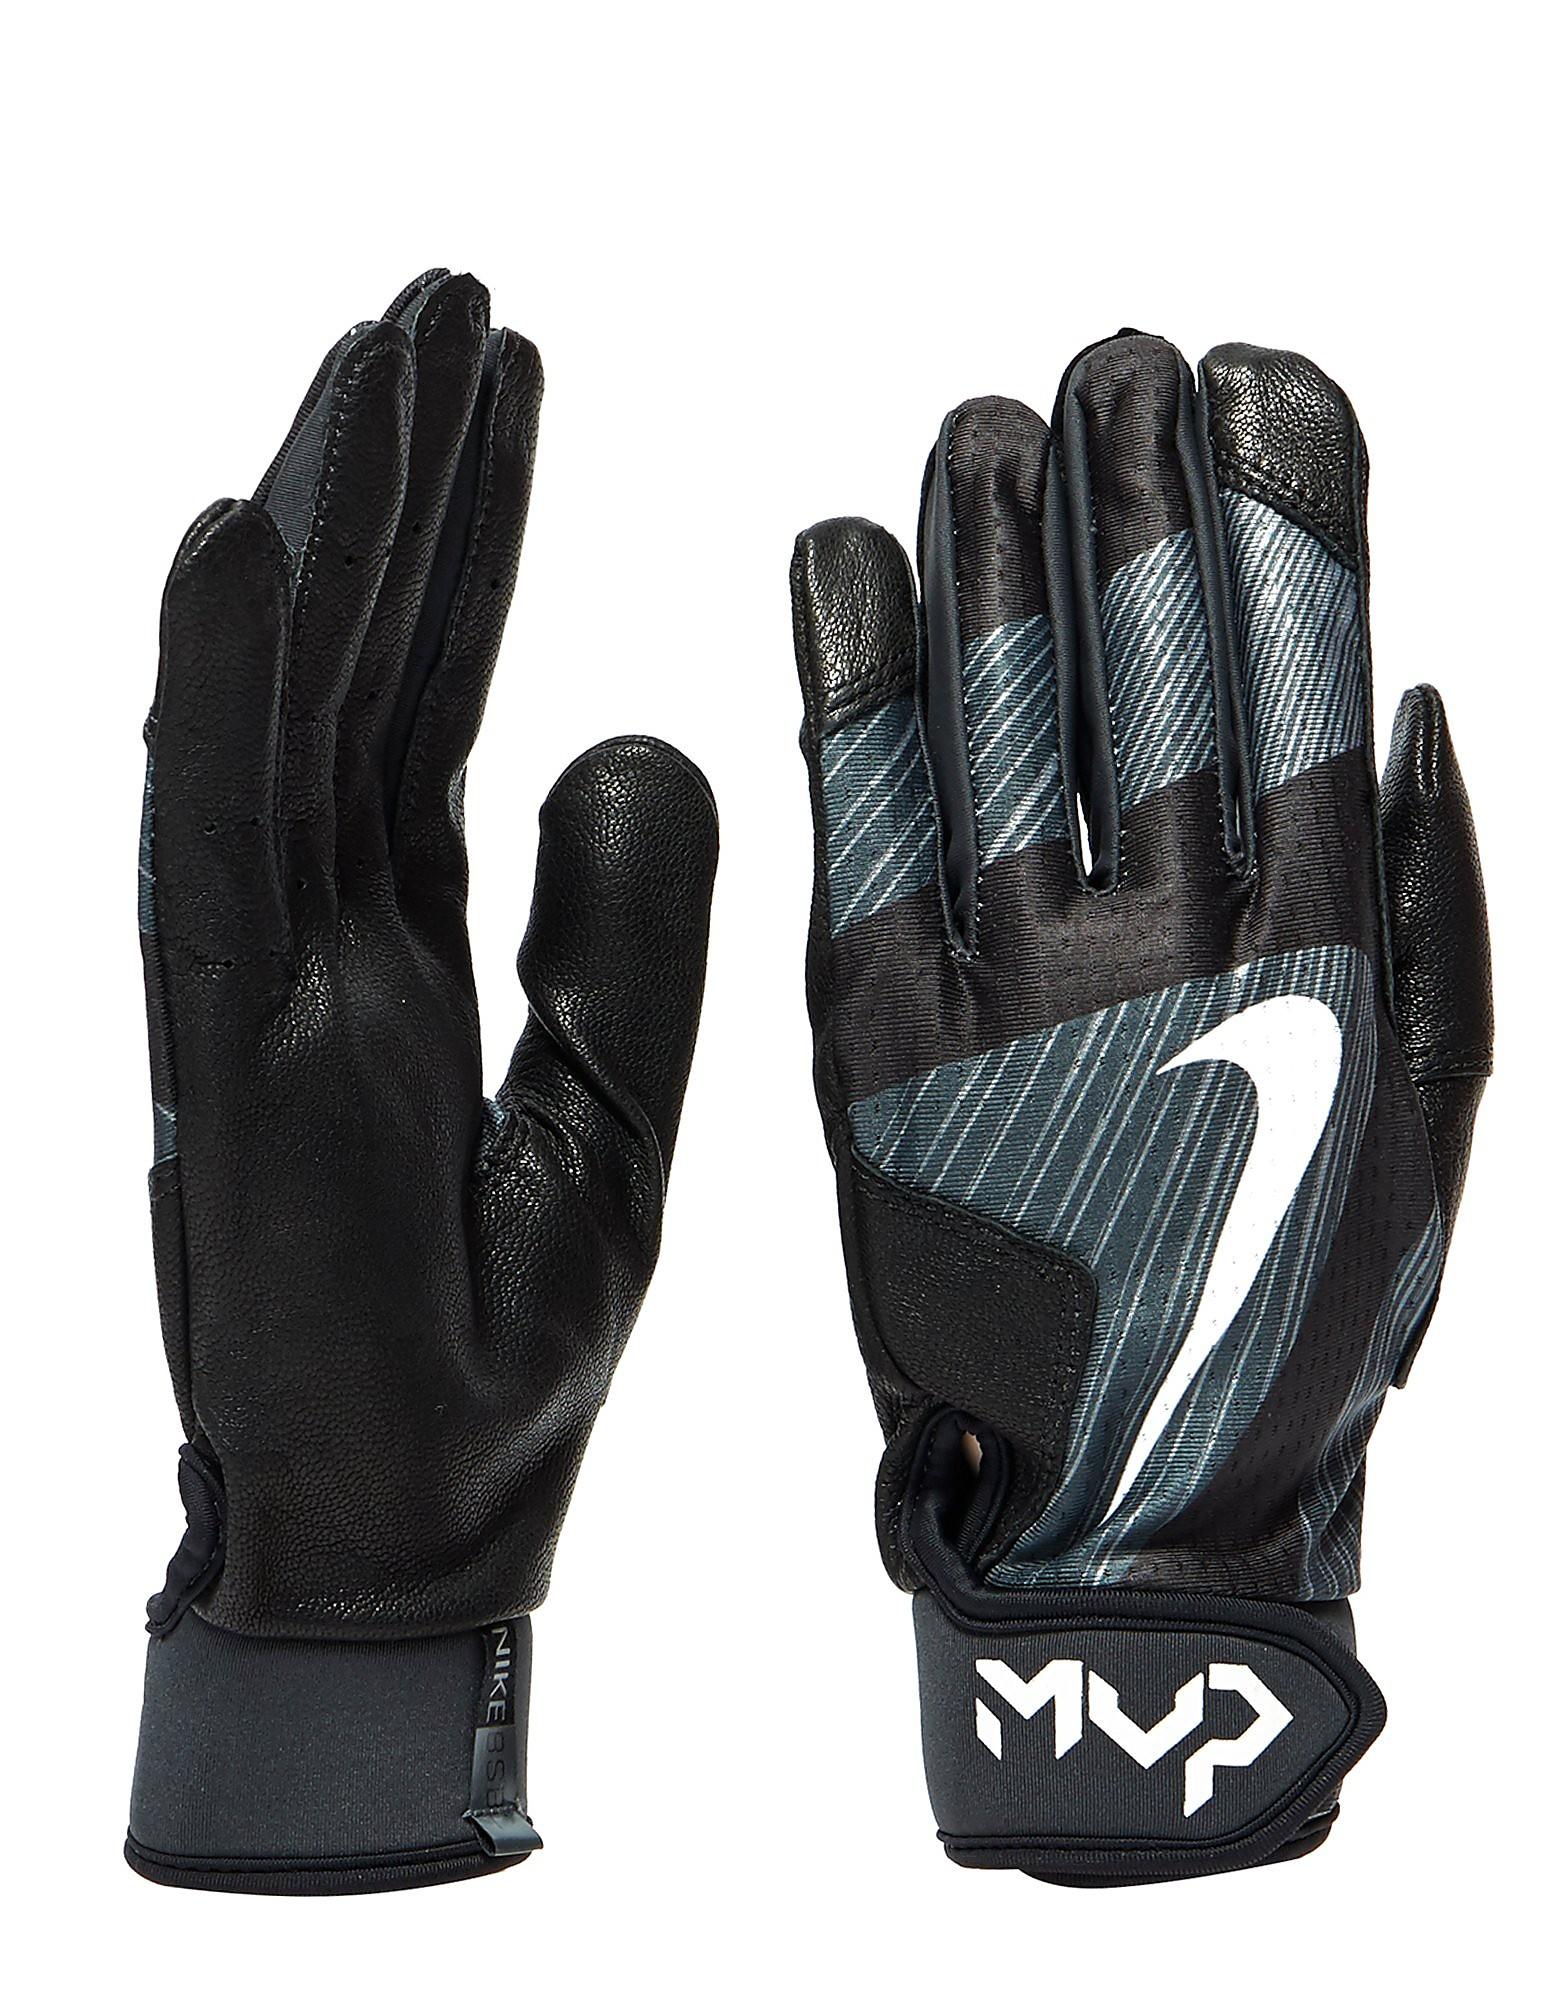 Nike MVP Edge Baseballhandschuhe